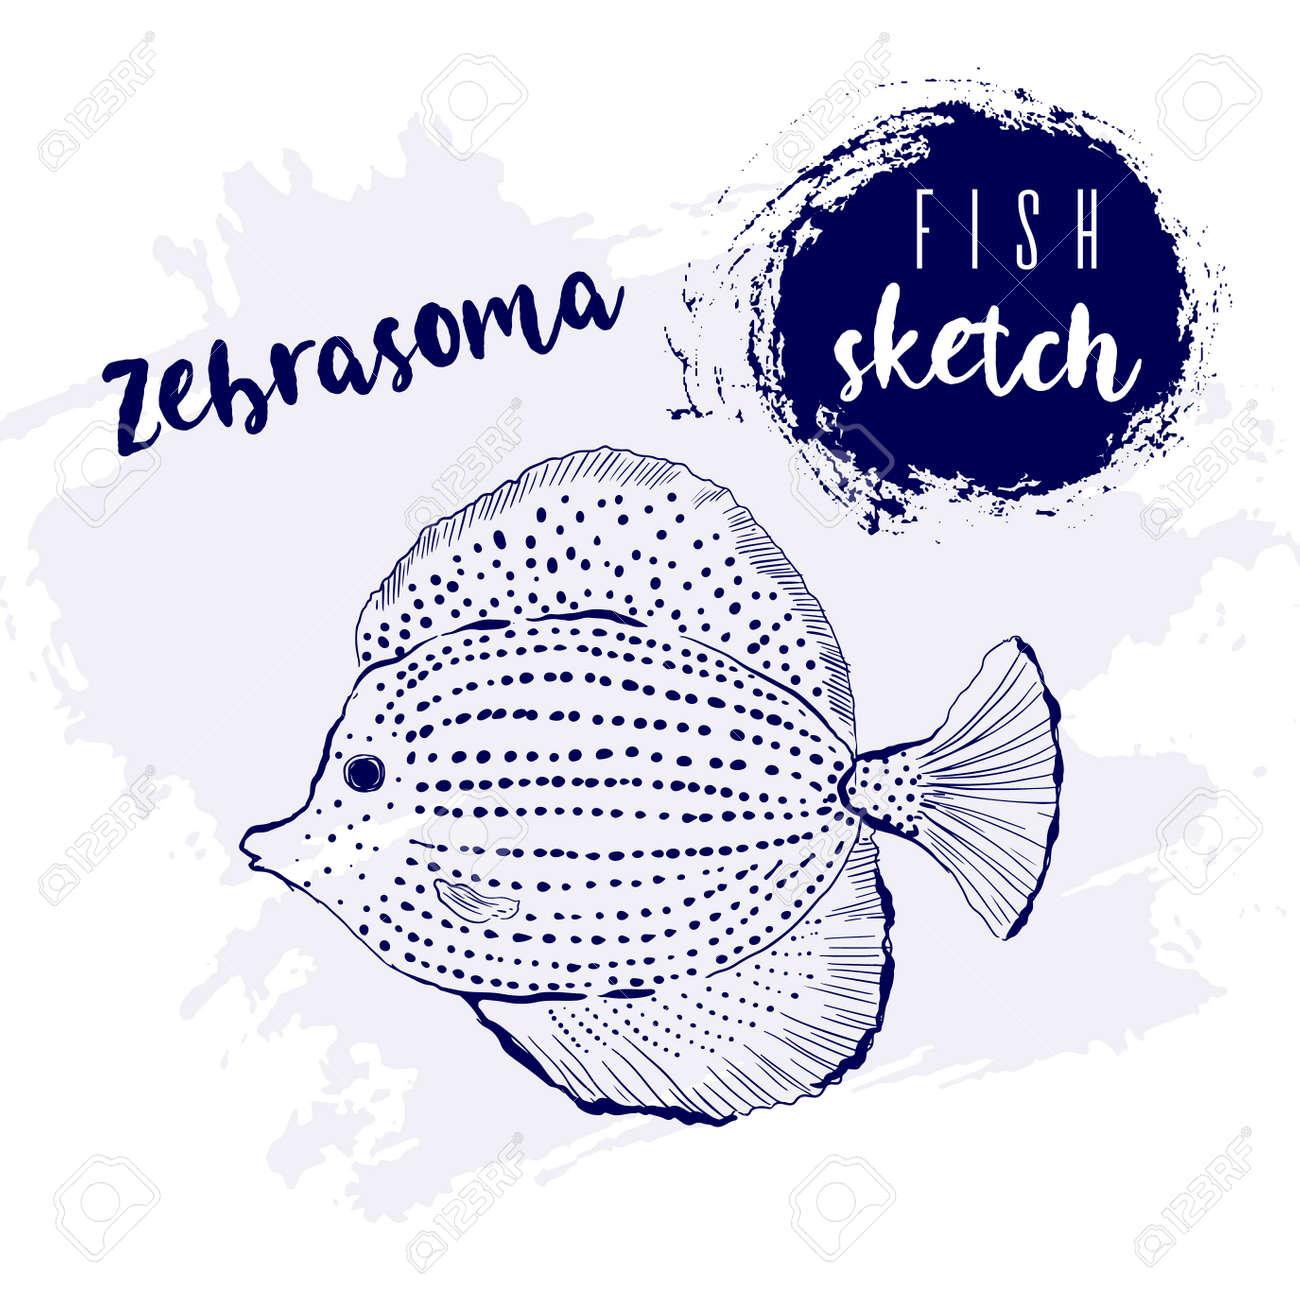 Vintage fish zebrasoma marine sketch.Retro line style.Hand drawn underwater. - 169556215